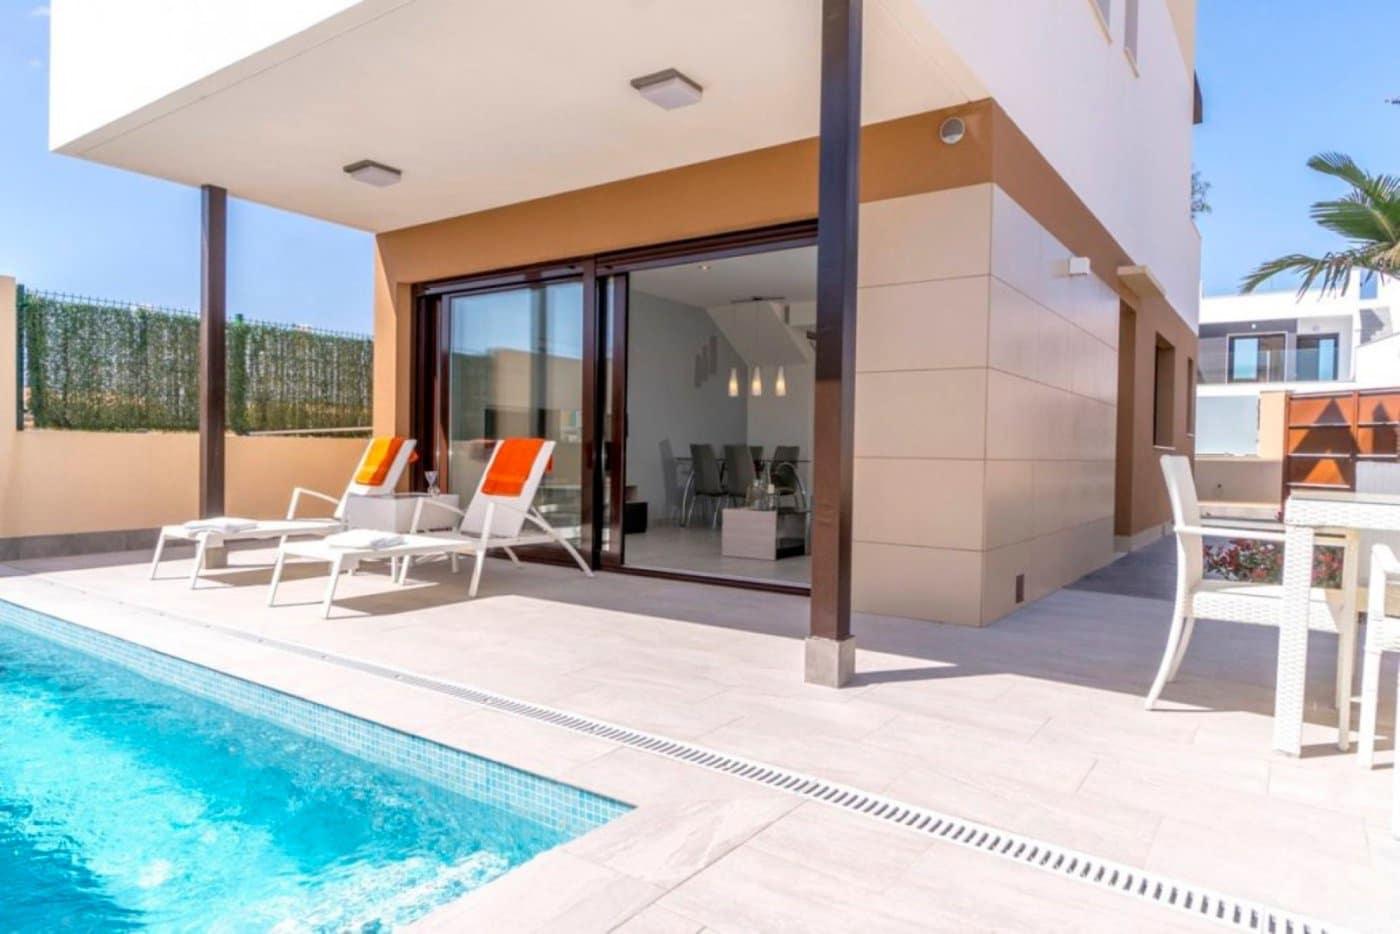 3 bedroom Semi-detached Villa for sale in San Pedro del Pinatar with pool - € 225,000 (Ref: 5456274)